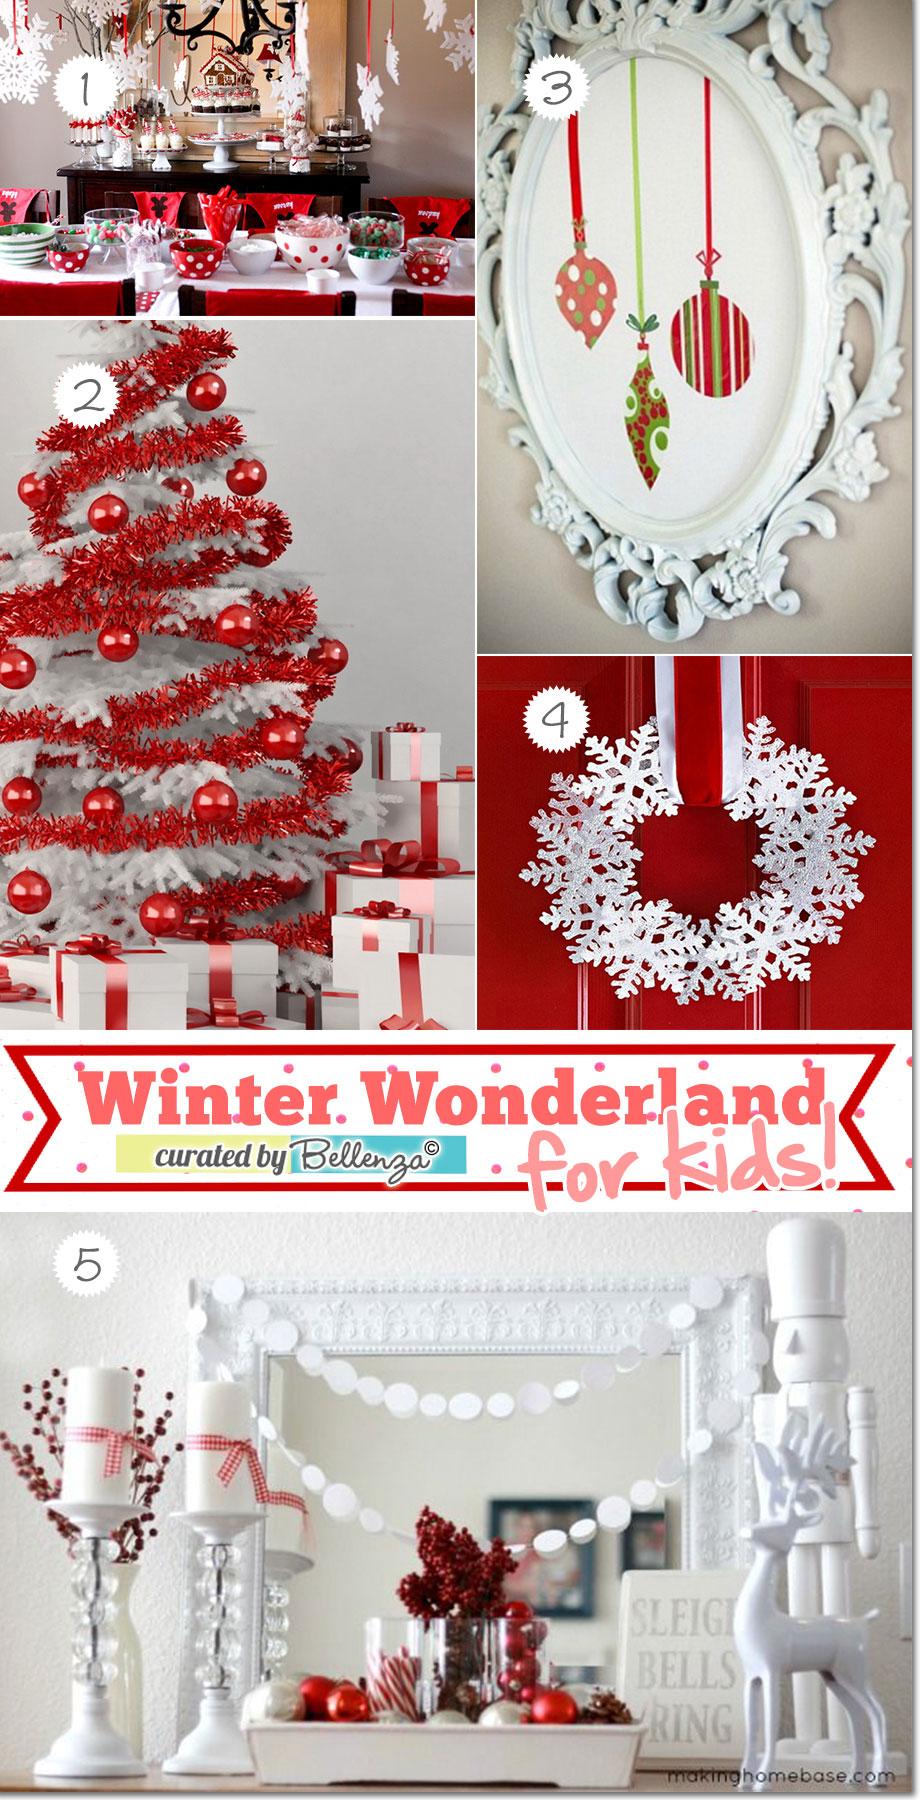 Winter wonderland for kids decorations